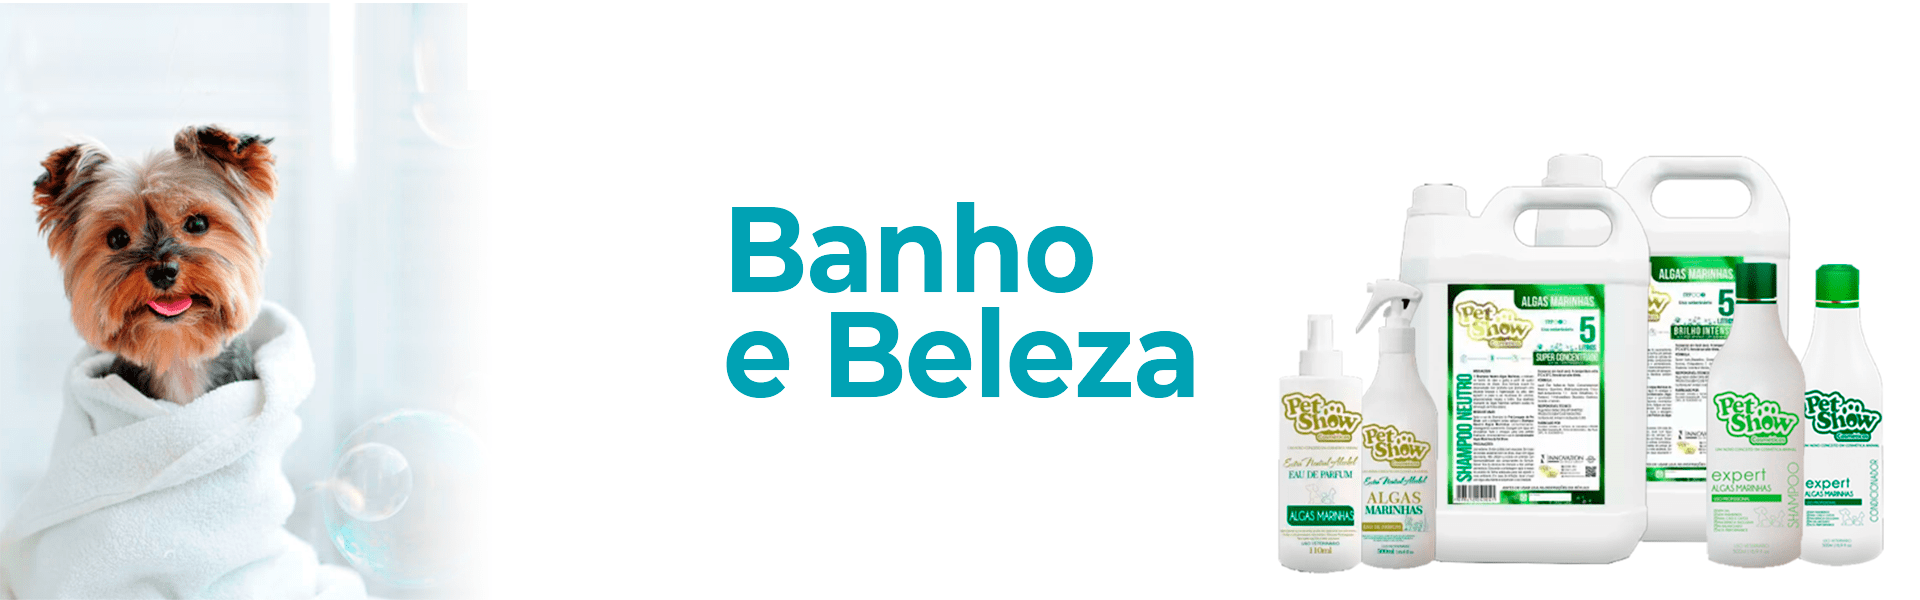 Banhoe e beleza - categoria  @Desktop